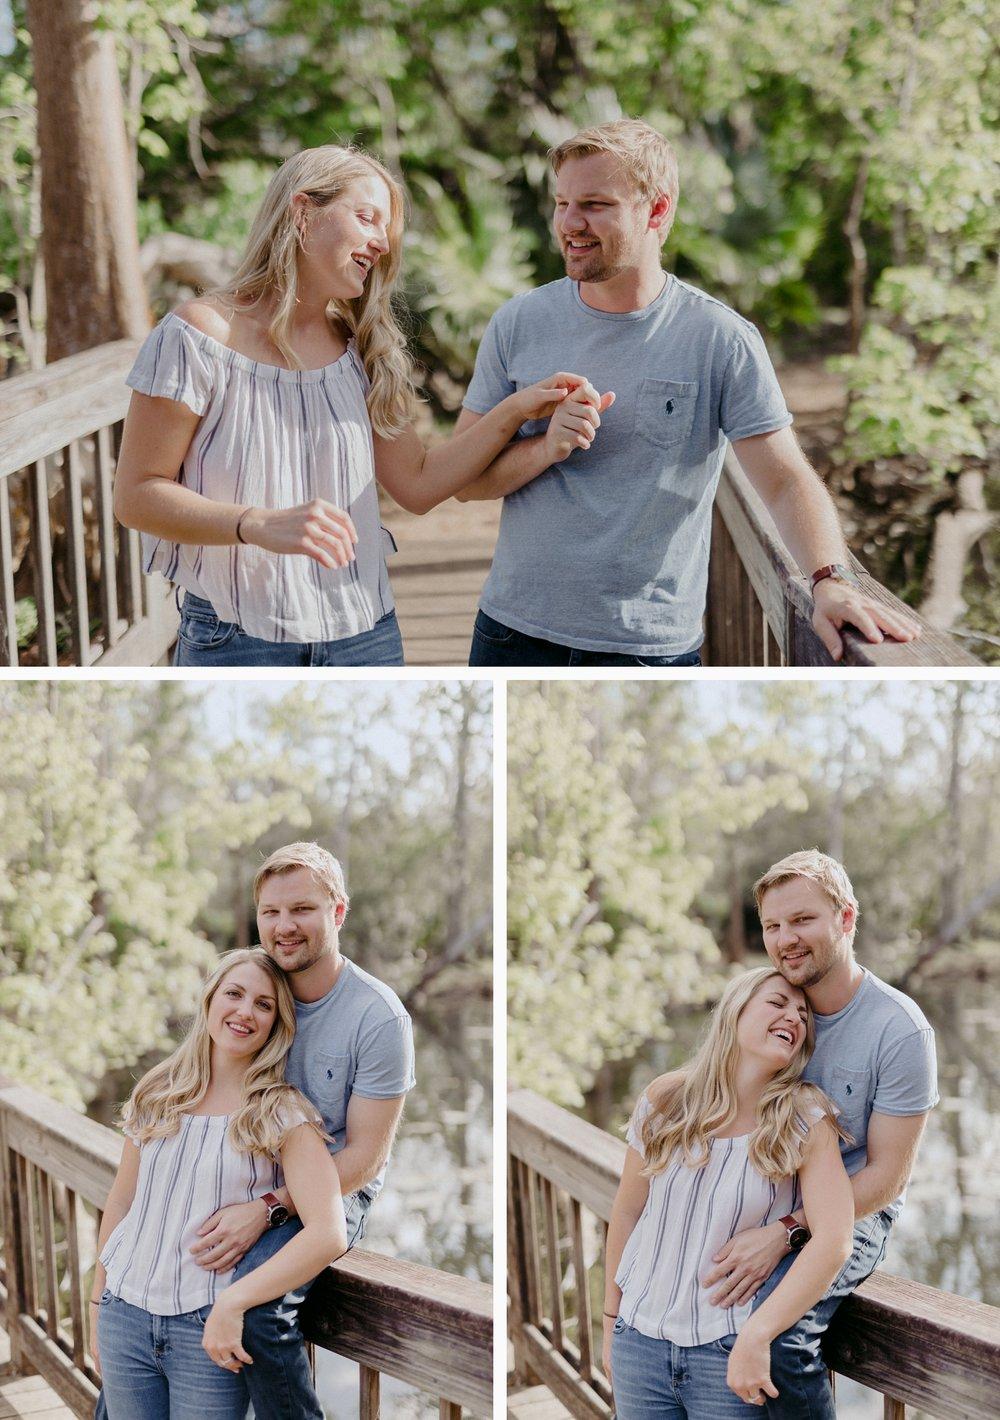 Kylie-And-Jack-Mead-Botanical-Garden-Engagement_0005.jpg